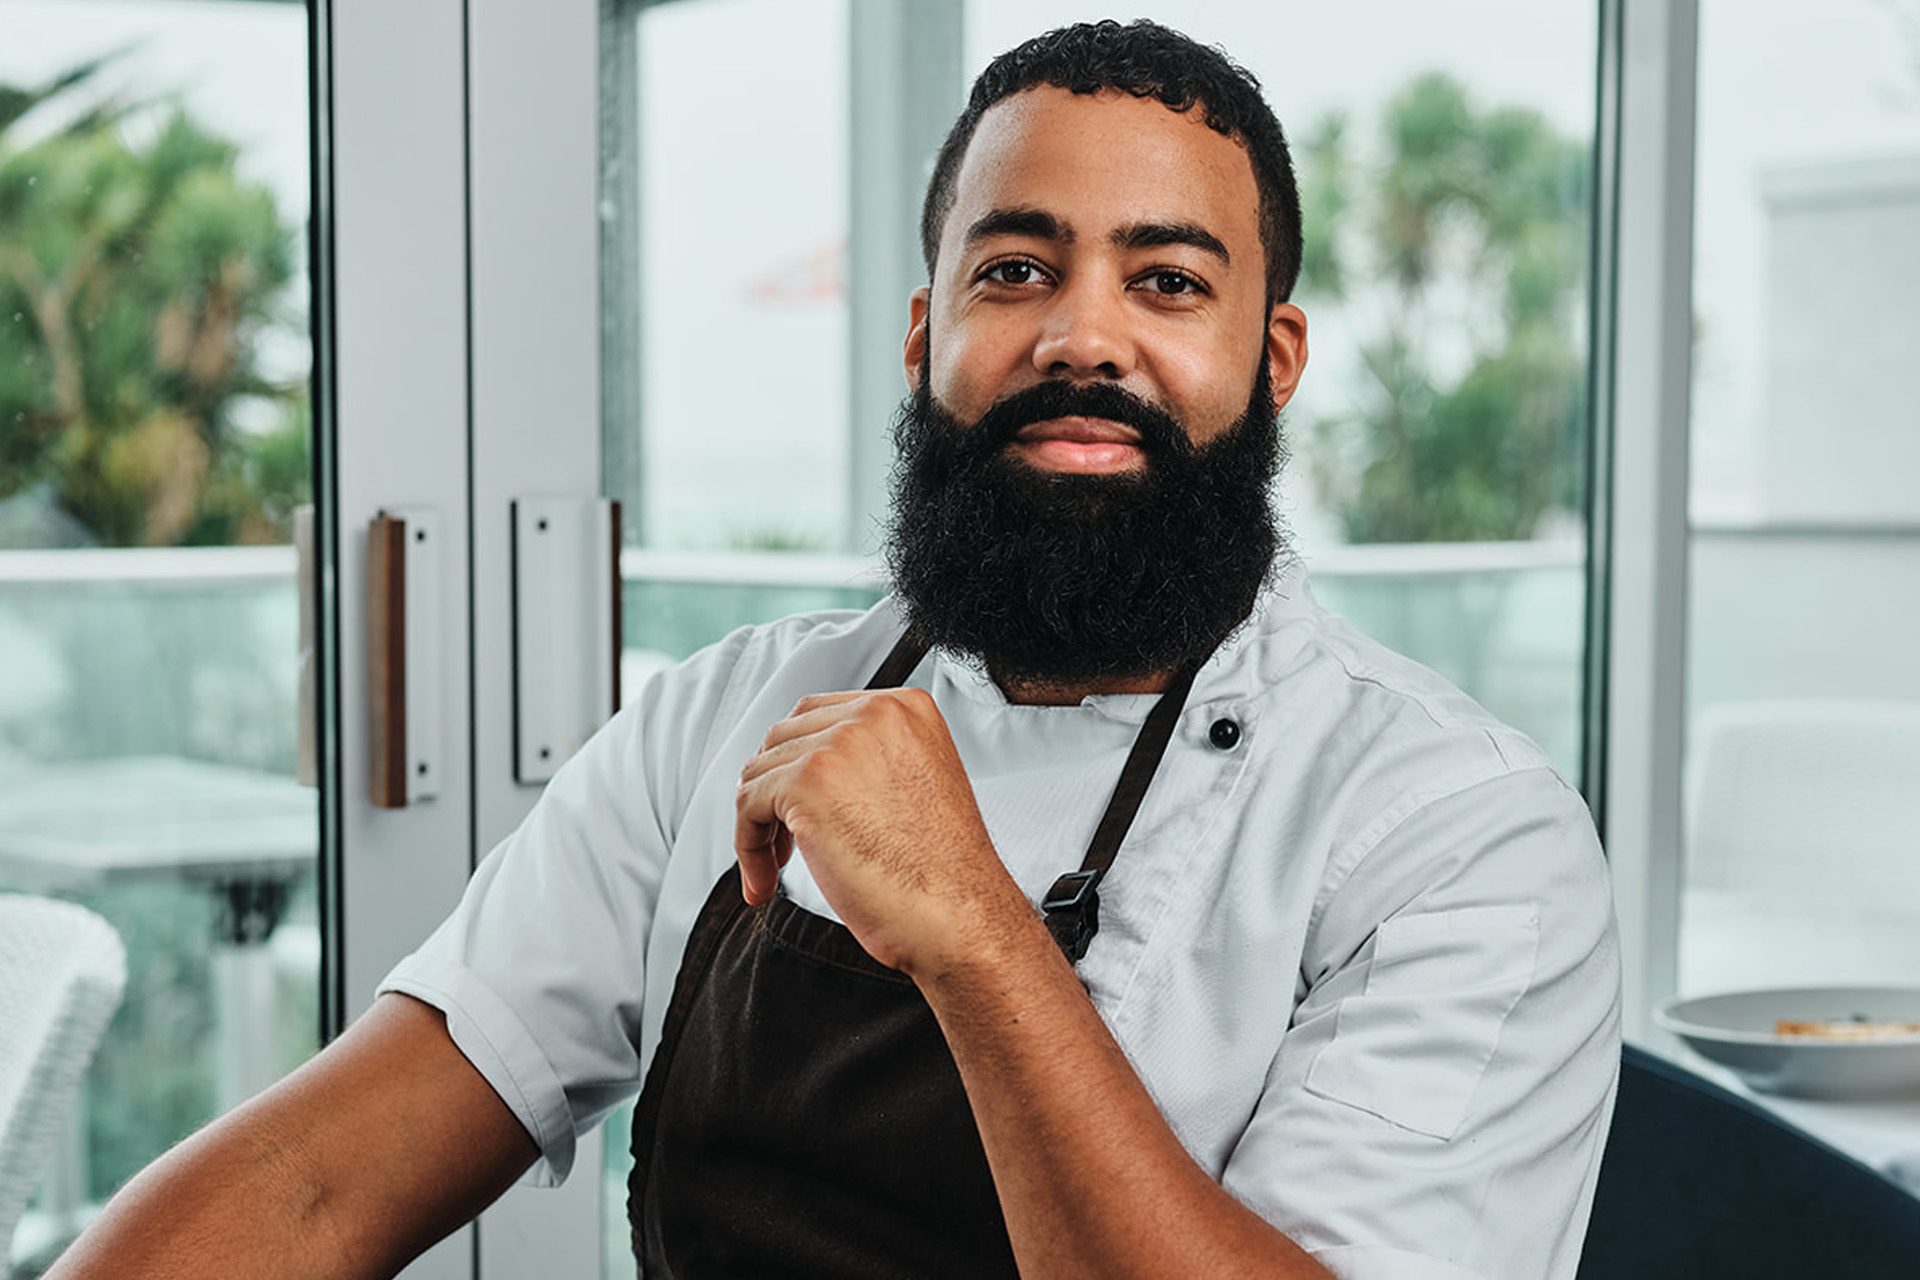 James Gordon Chef